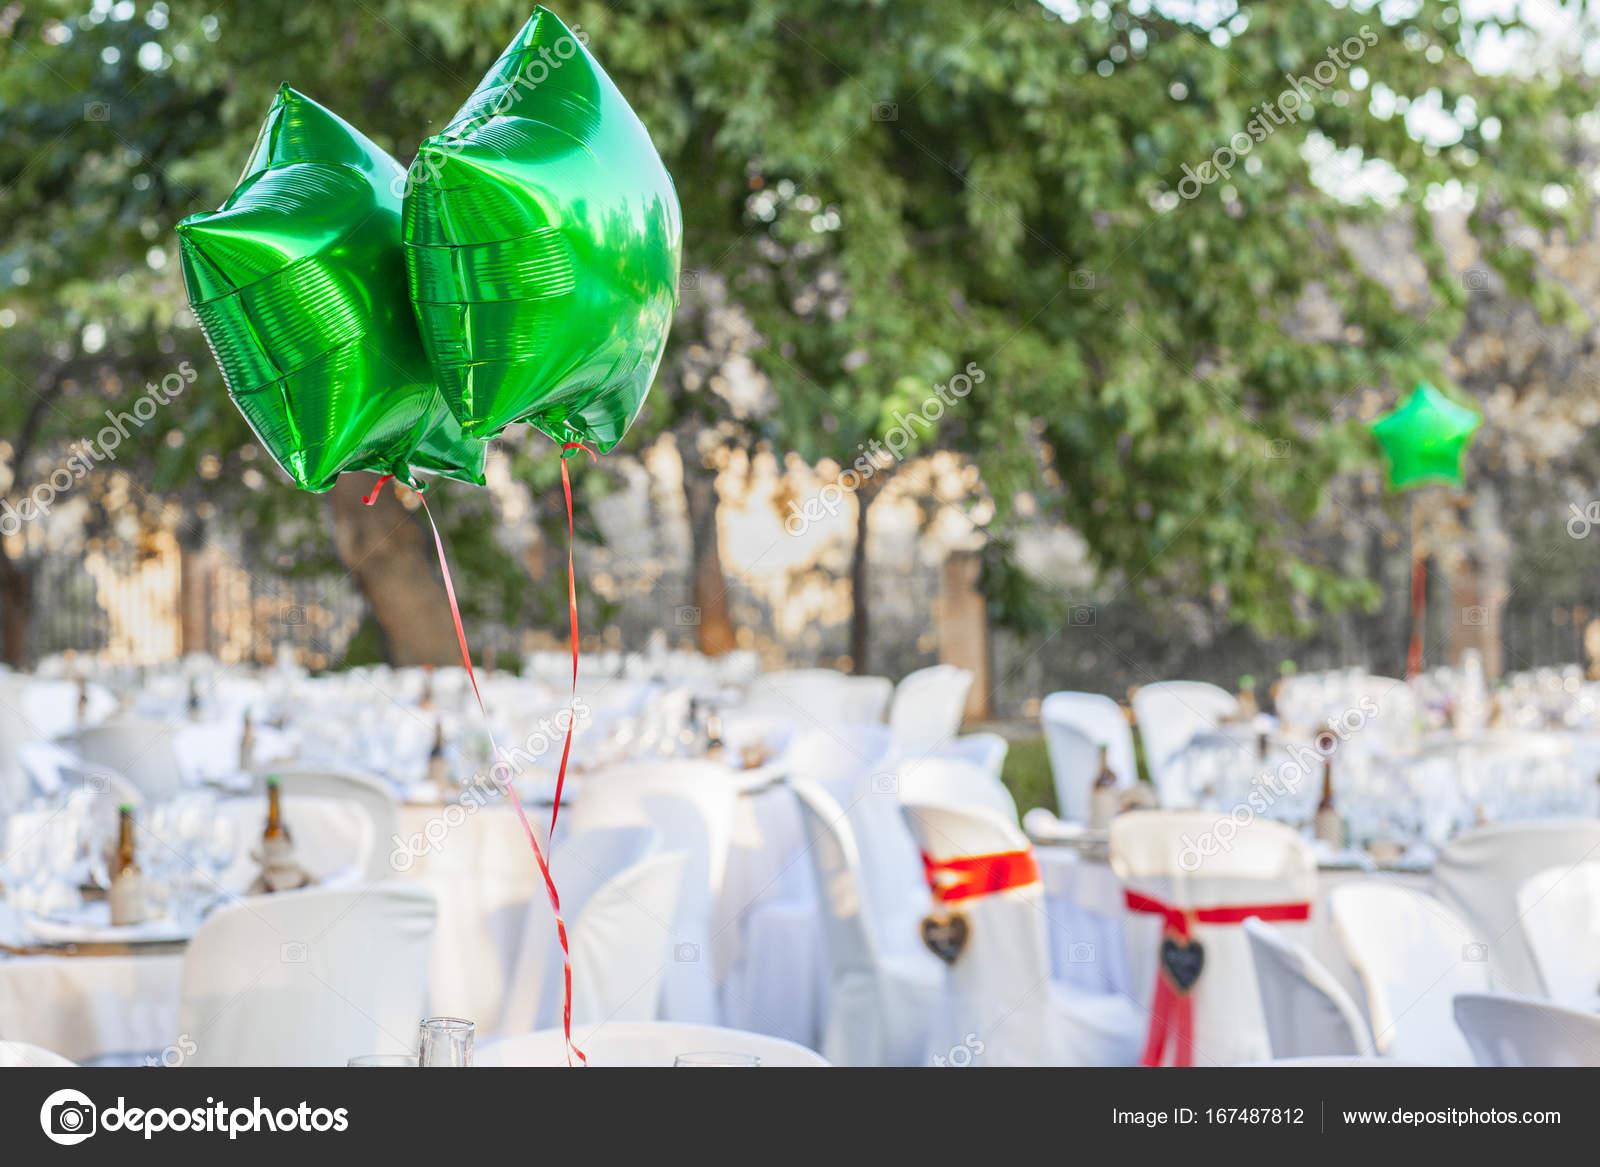 Green shiny balloons at garden table setting for wedding recepti u2014 Stock Photo & Green shiny balloons at garden table setting for wedding recepti ...